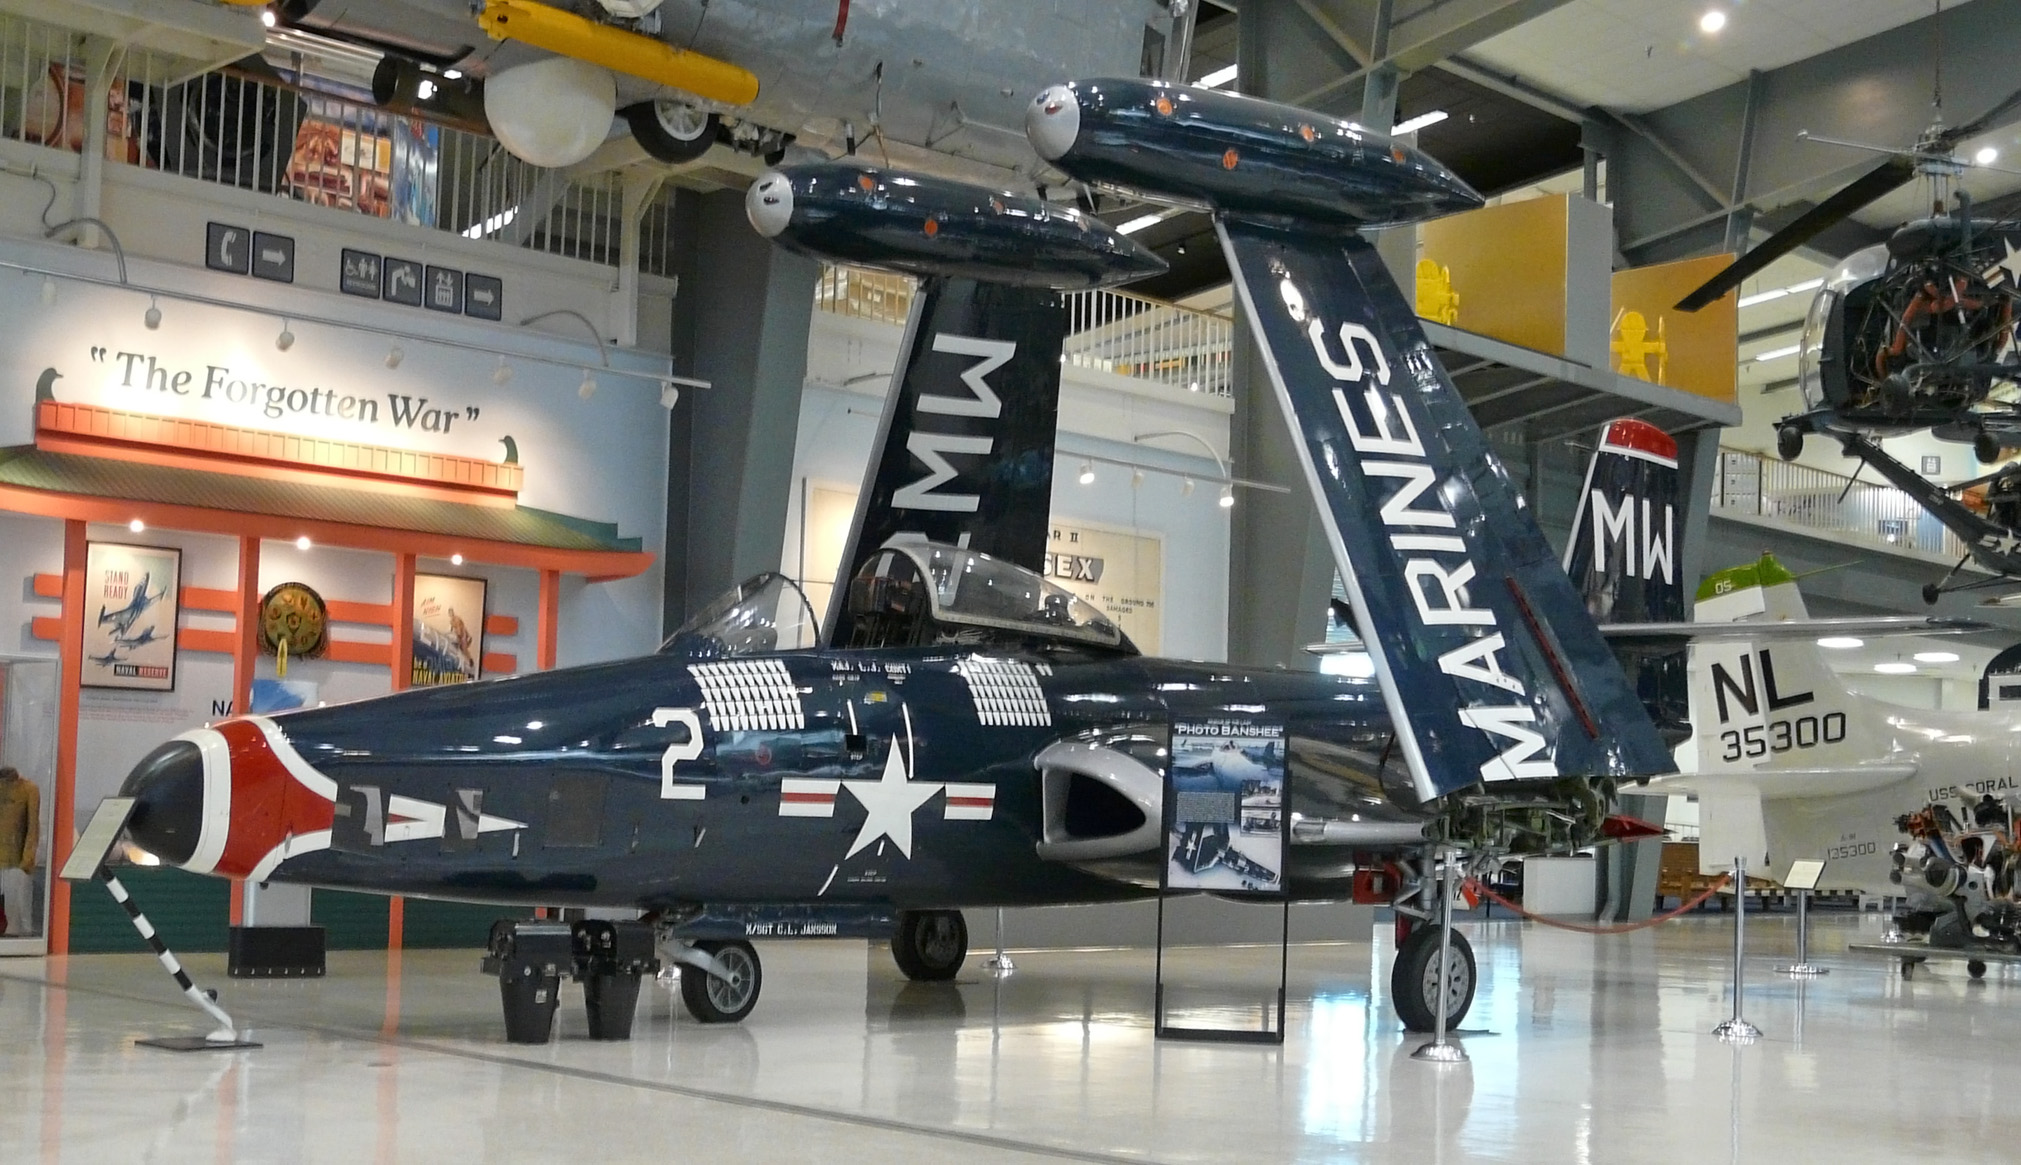 File:McDonnell F2H-2P Banshee, Naval Aviation Museum, Pensacola, Florida.jpg - Wikimedia Commons